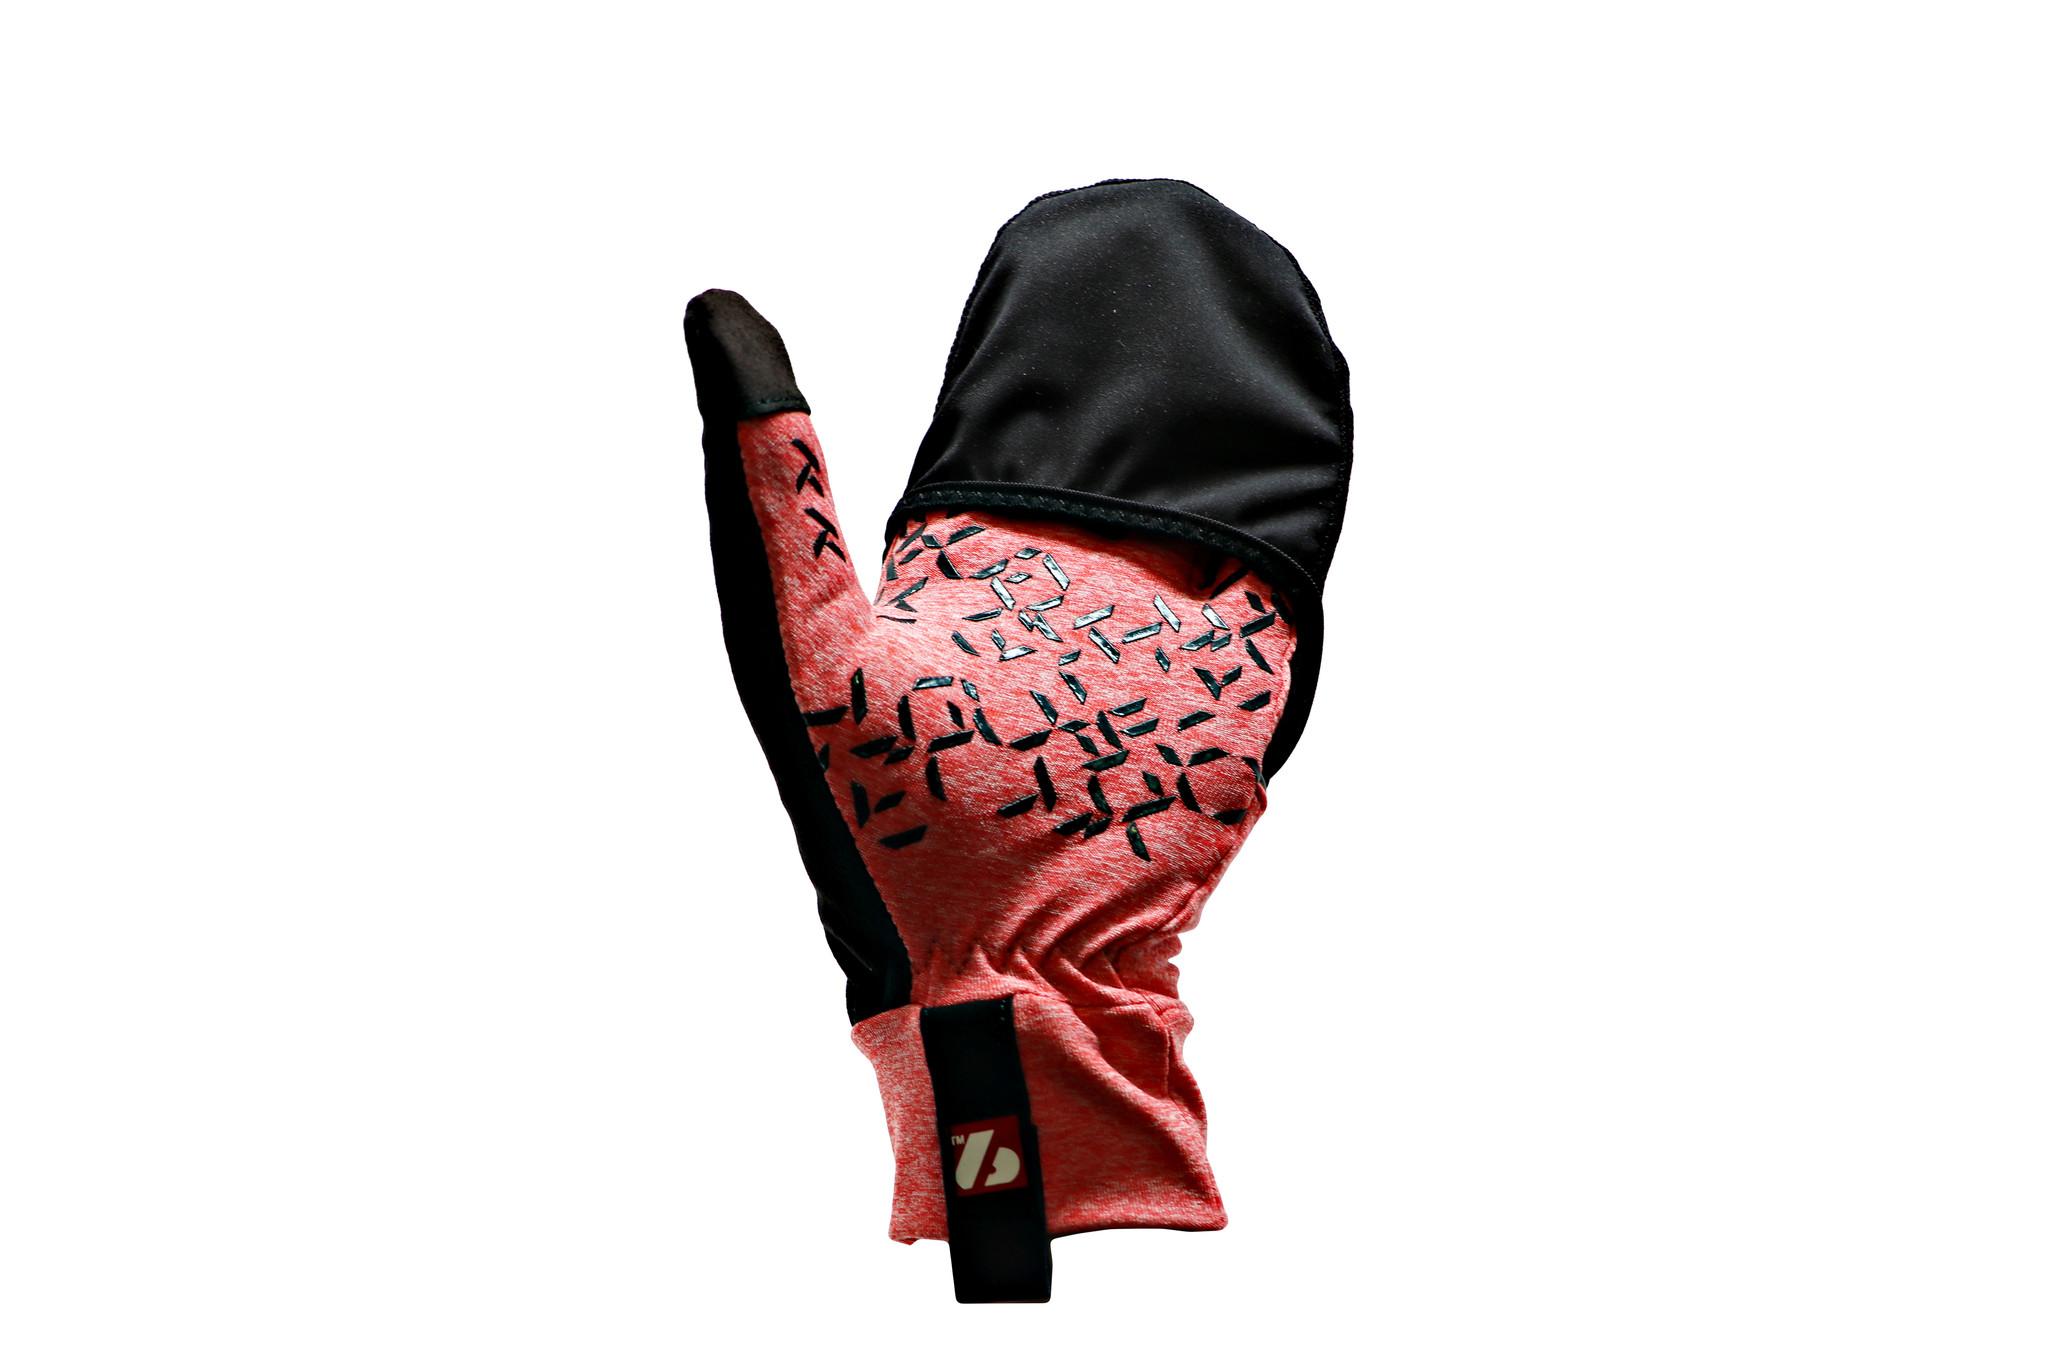 barnett NBG-13 winter ski glove -5 ° to -10 ° -pink